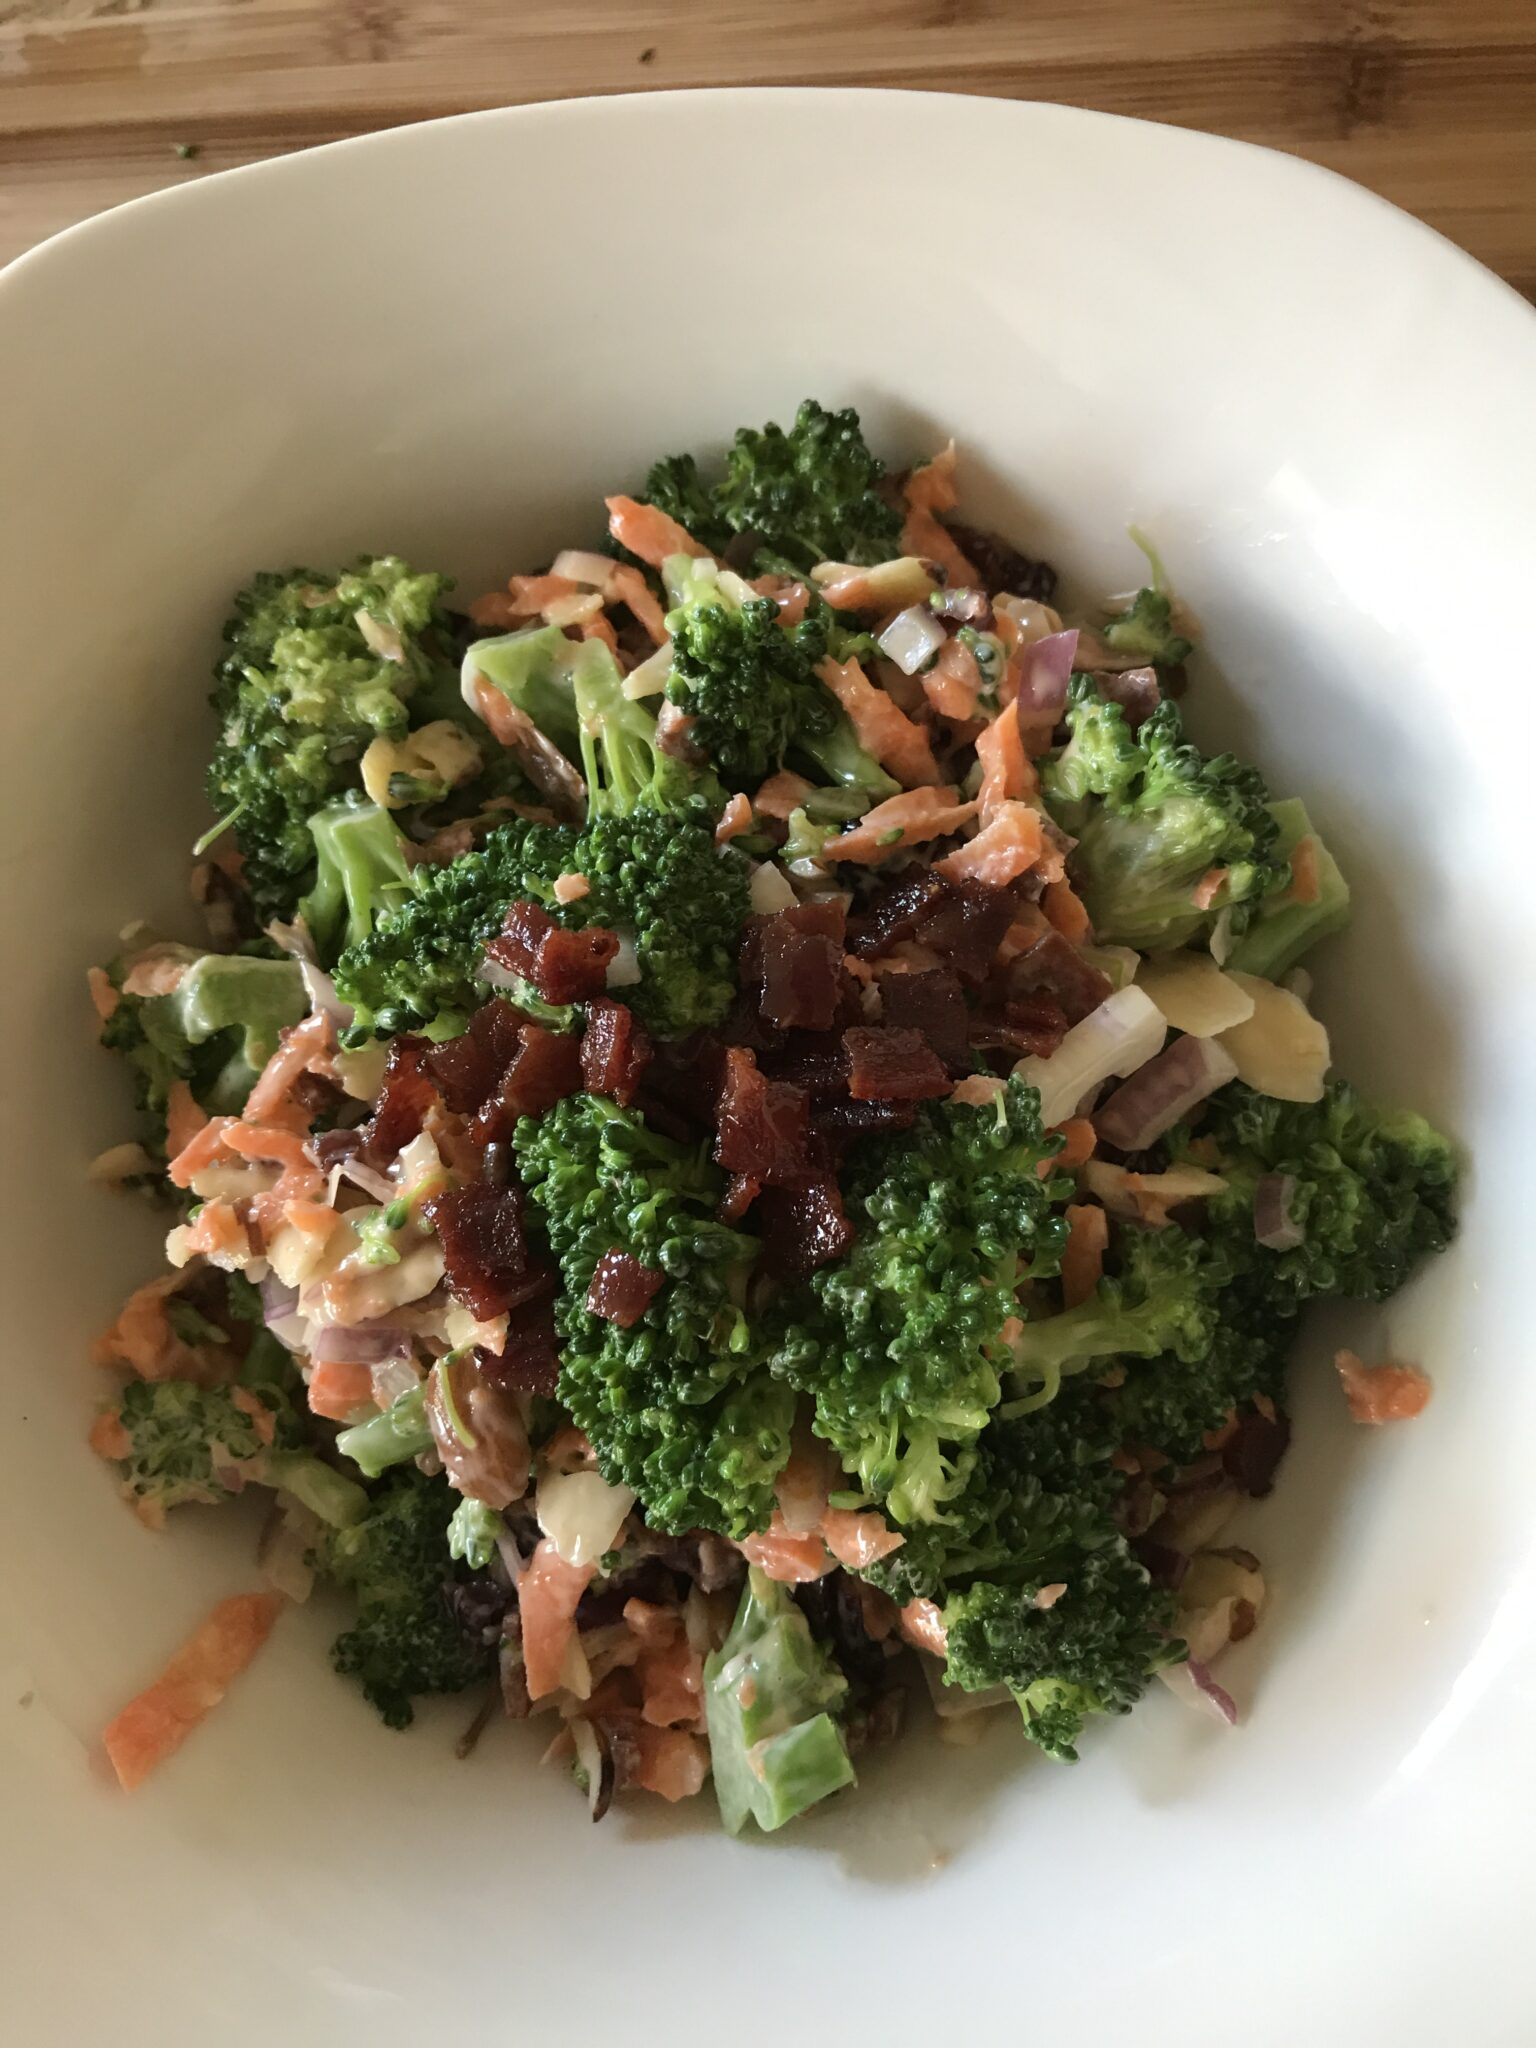 Lazy Summer Days – Broccoli Salad